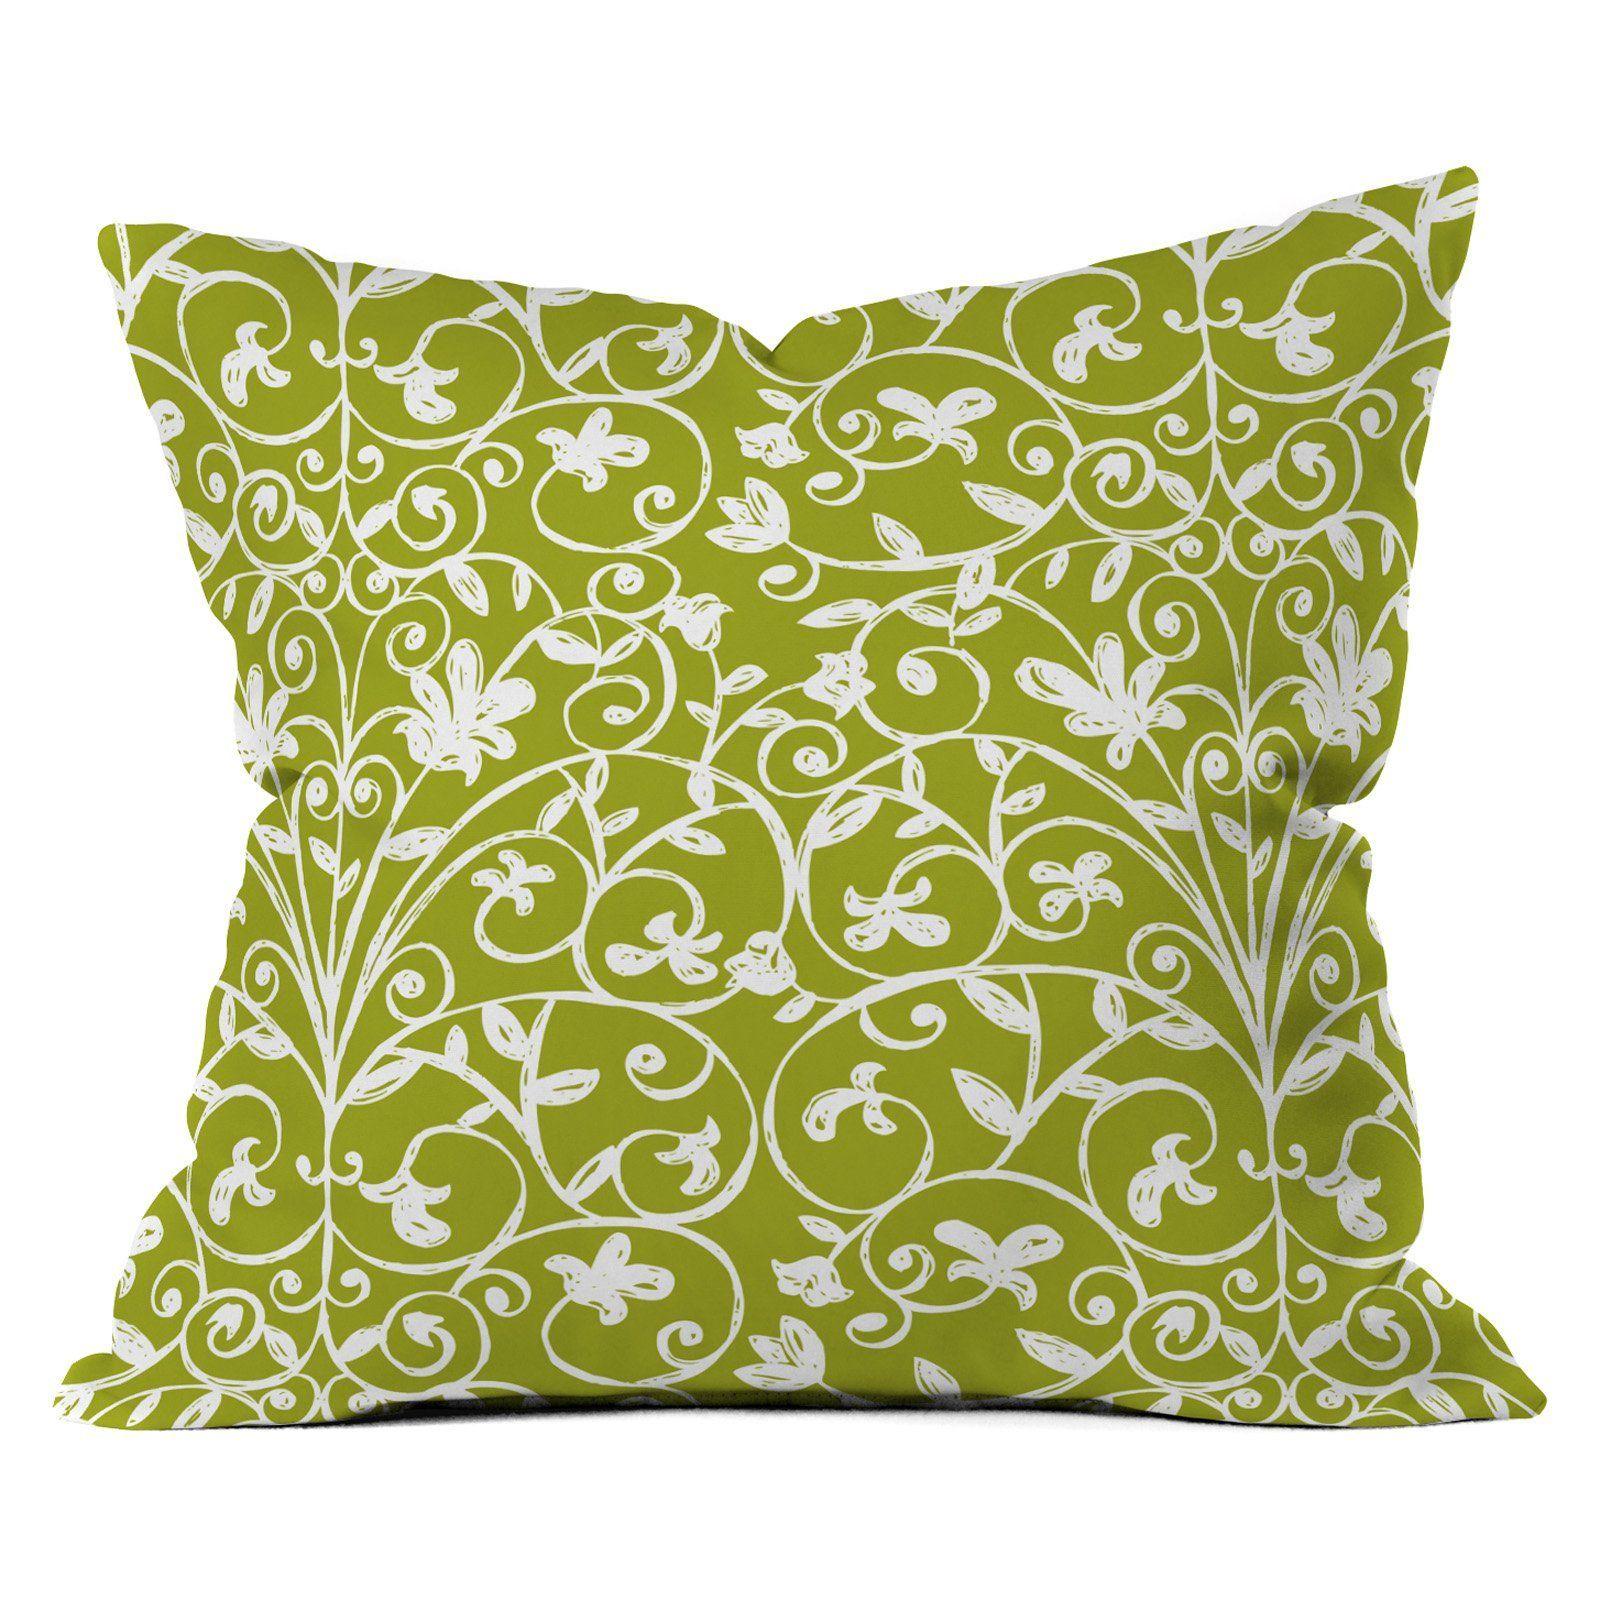 Deny Designs Heather Dutton Carriage House Throw Pillow - 58567-OTHRP16